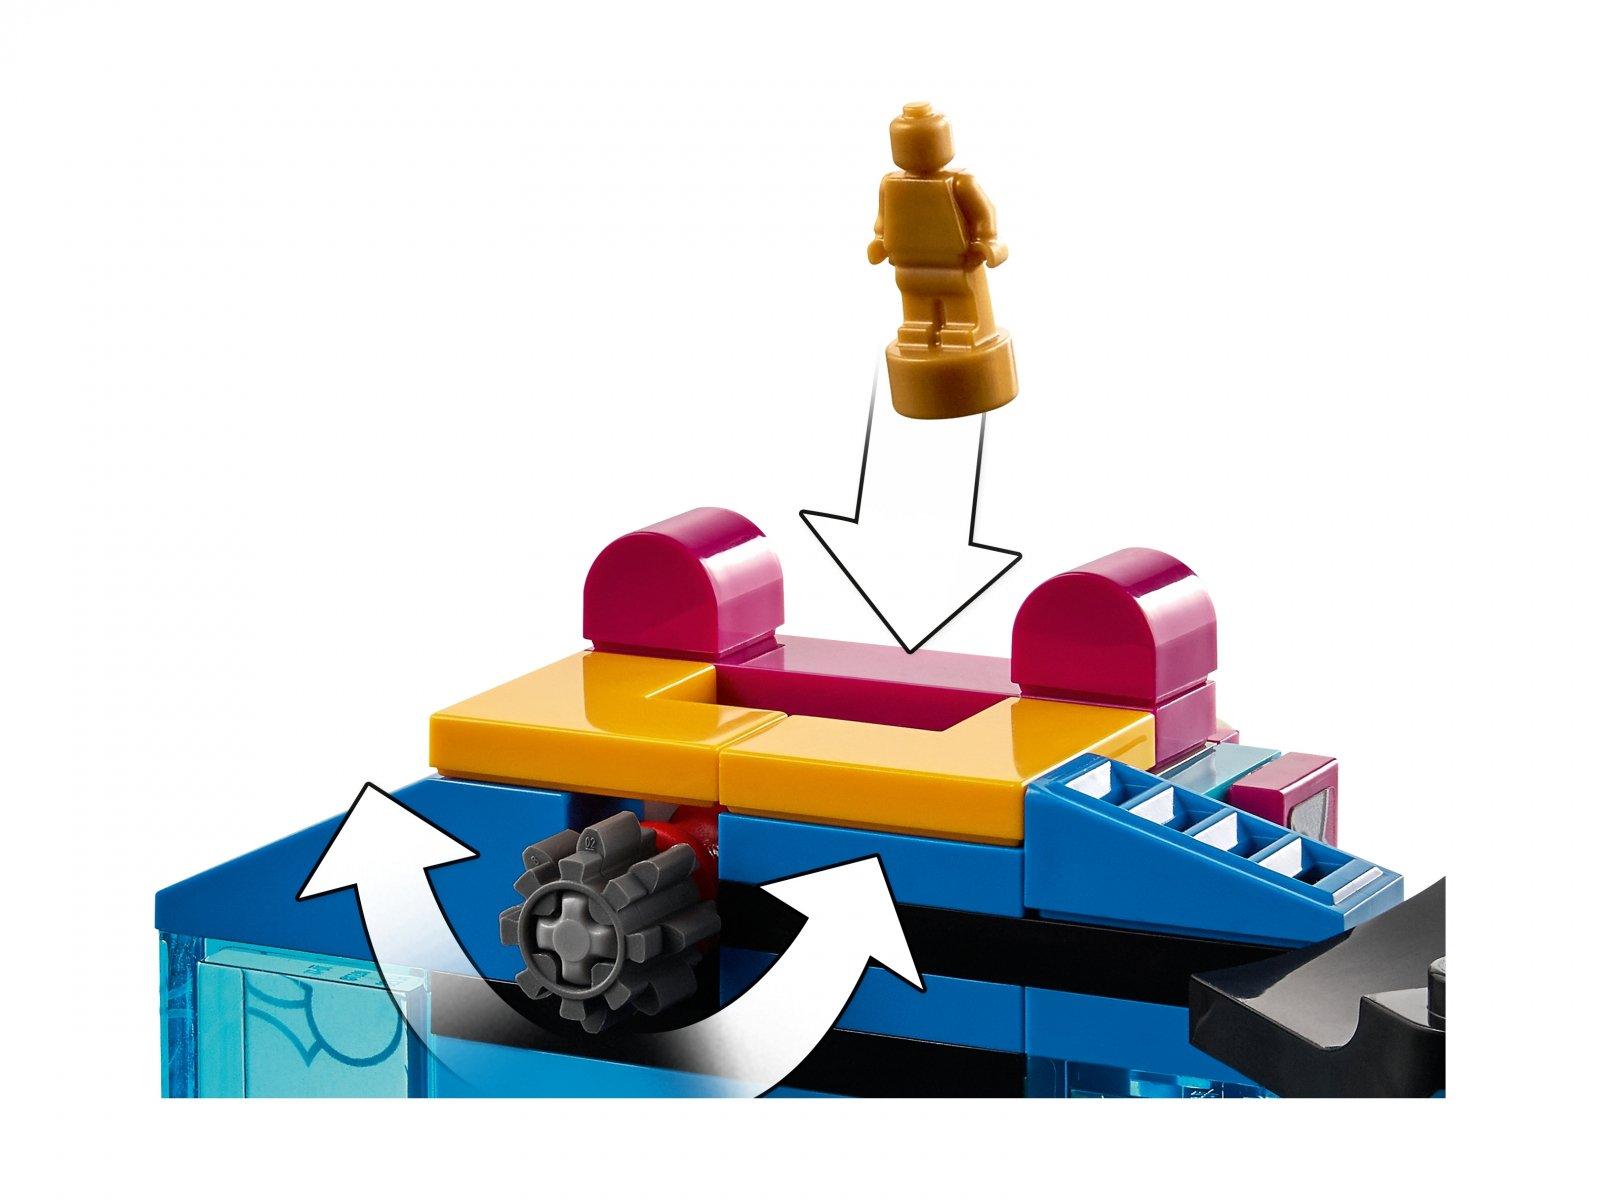 LEGO Monkie Kid Lwi strażnik Monkie Kida 80021